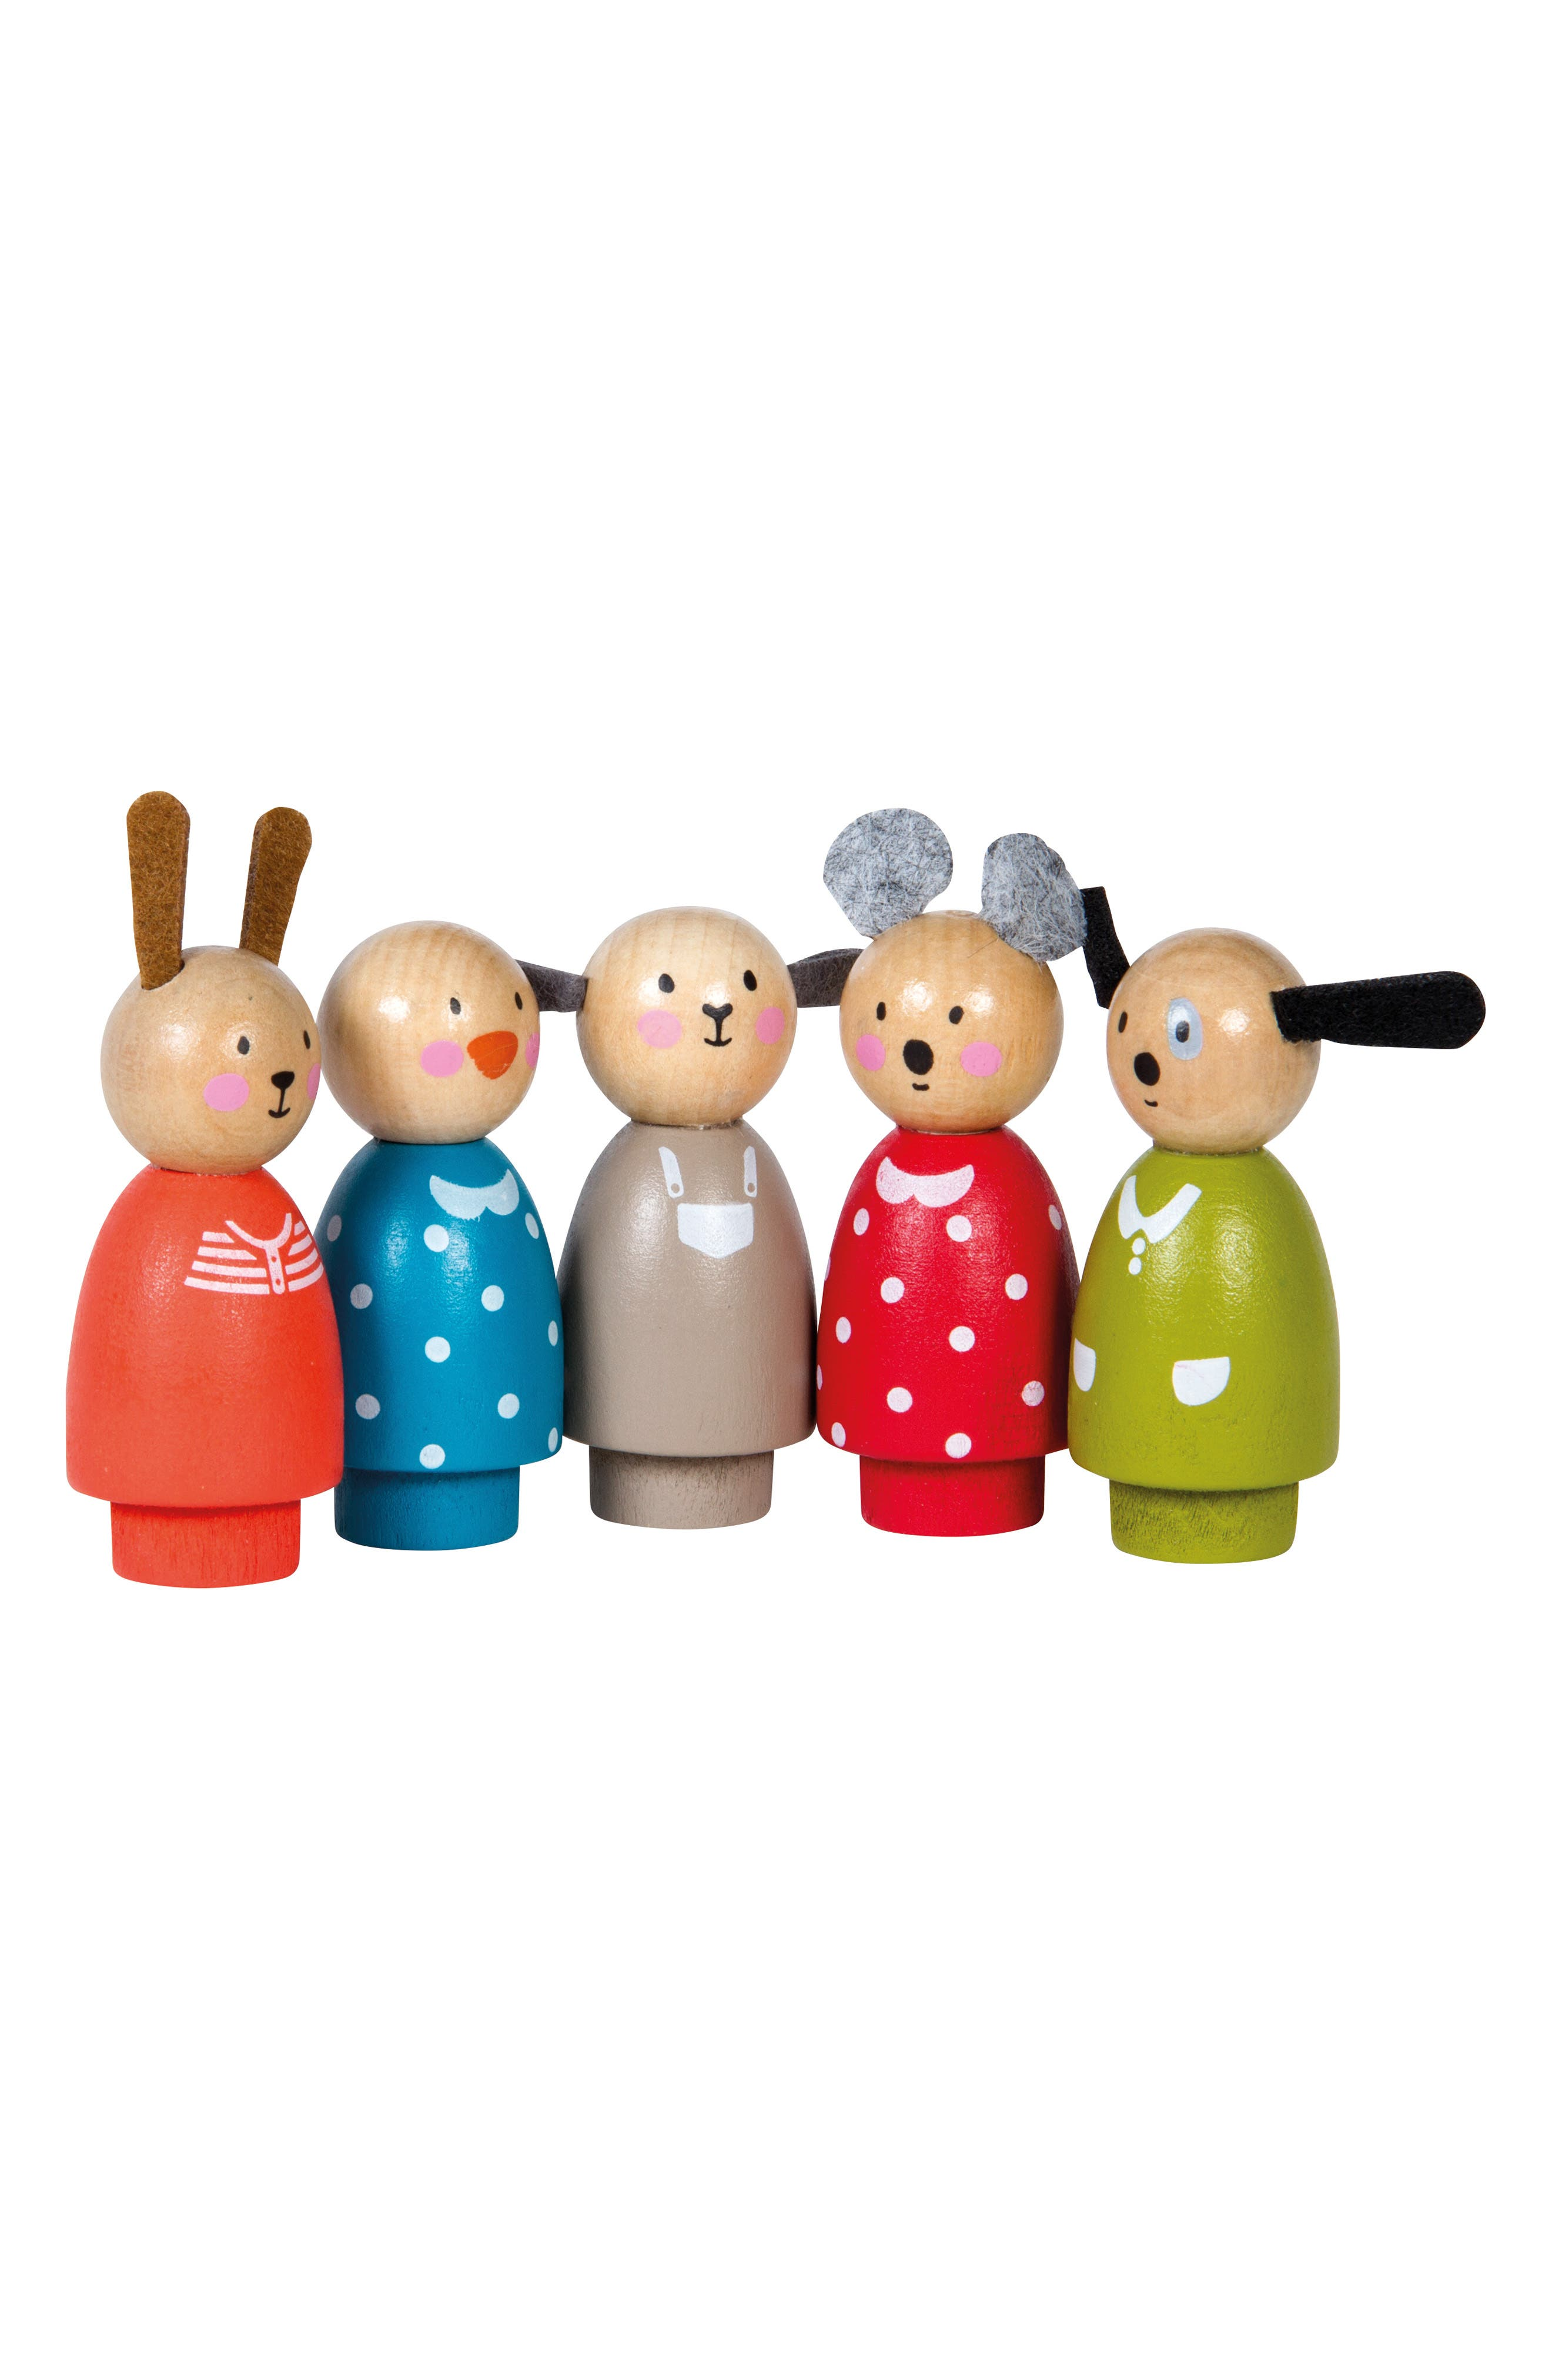 Moulin Roty La Grande Famille 5Piece Wooden Character Set